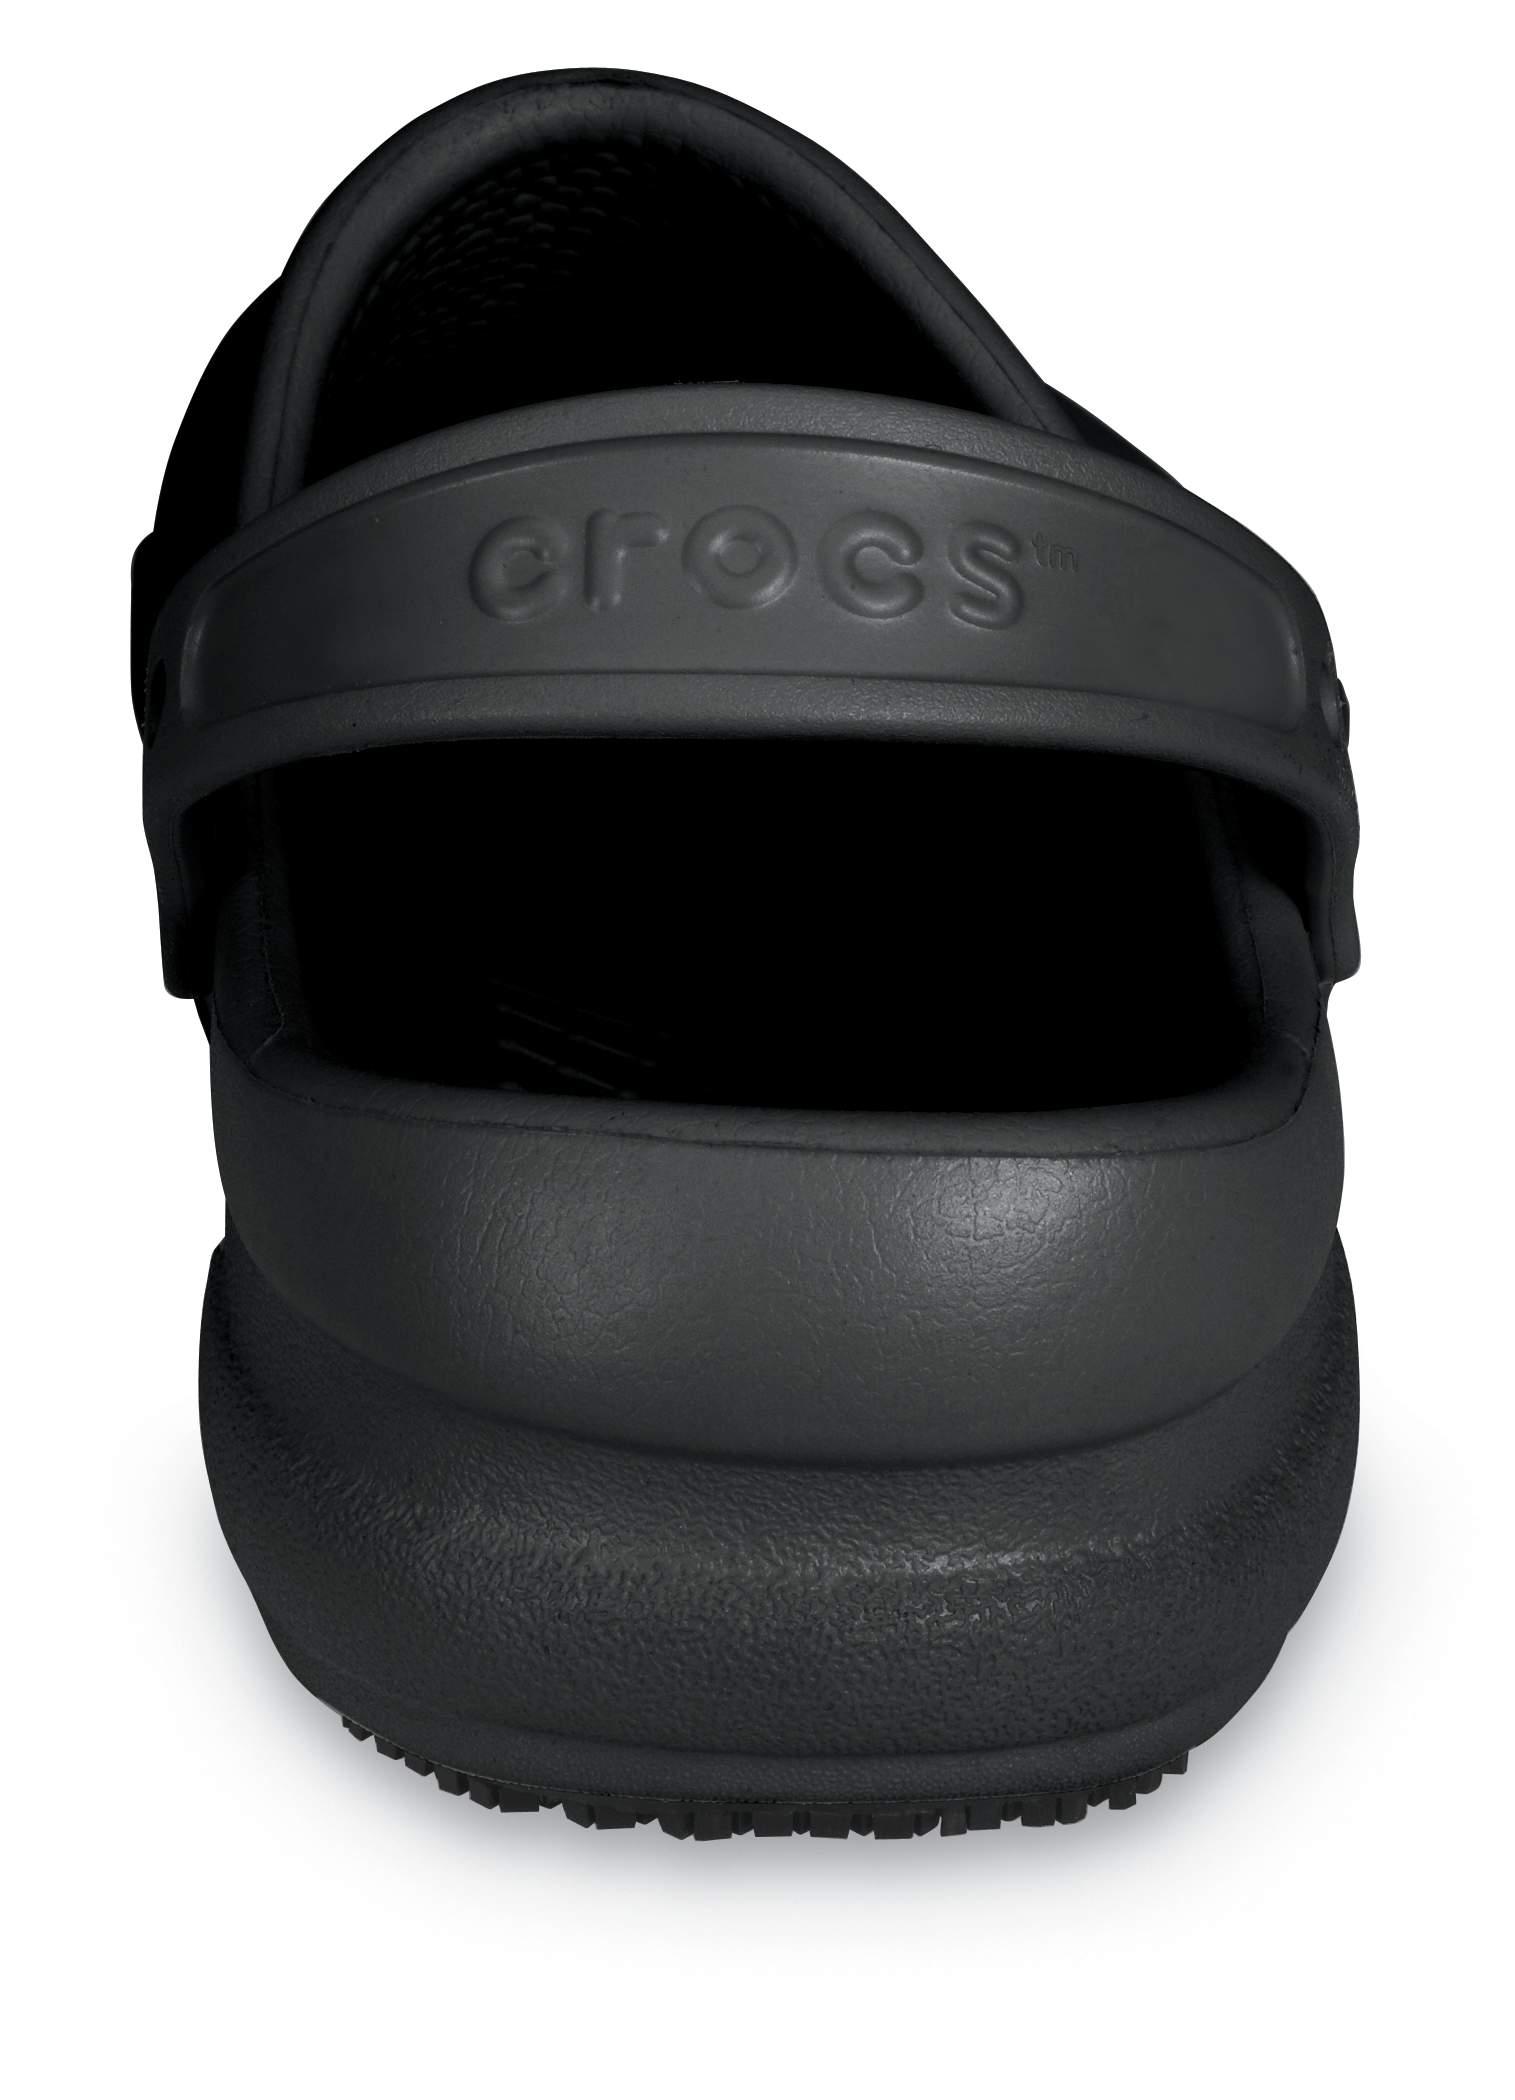 Crocs™ Bistro | Kitchen Chef Work Shoe | Crocs Official Site